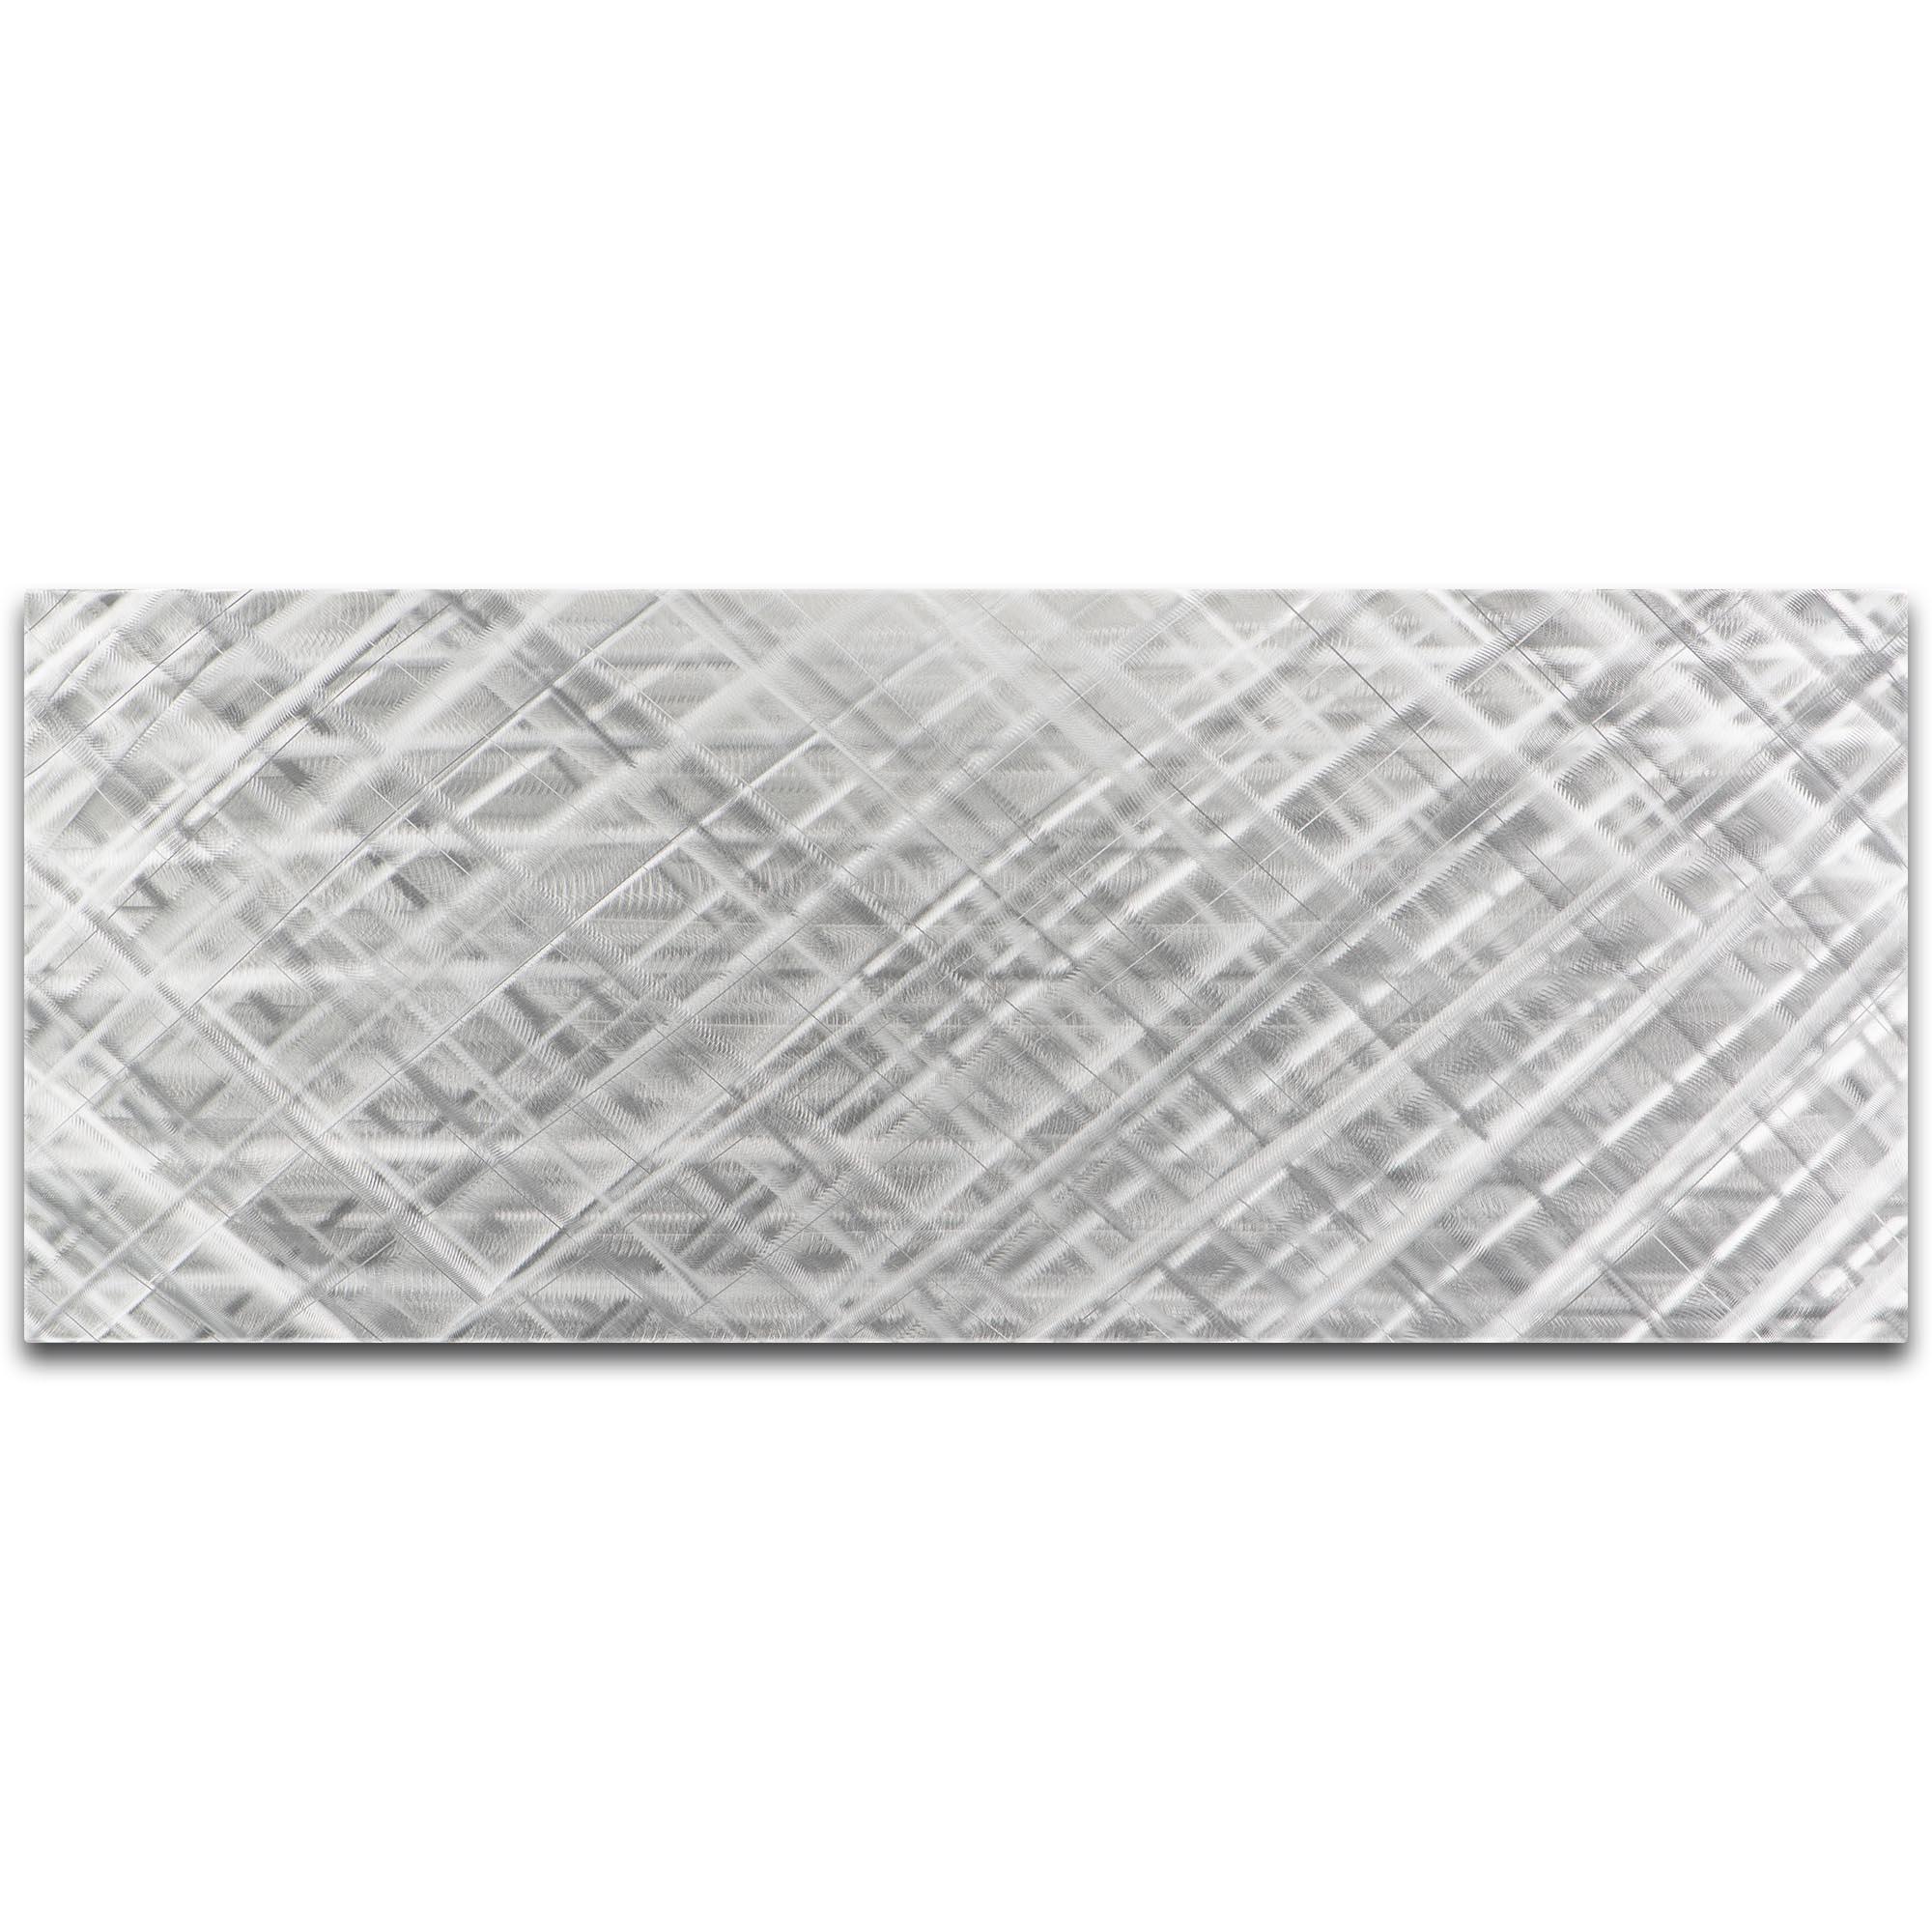 Helena Martin 'Silver Diamonds' 48in x 19in Original Abstract Metal Art on Ground Metal